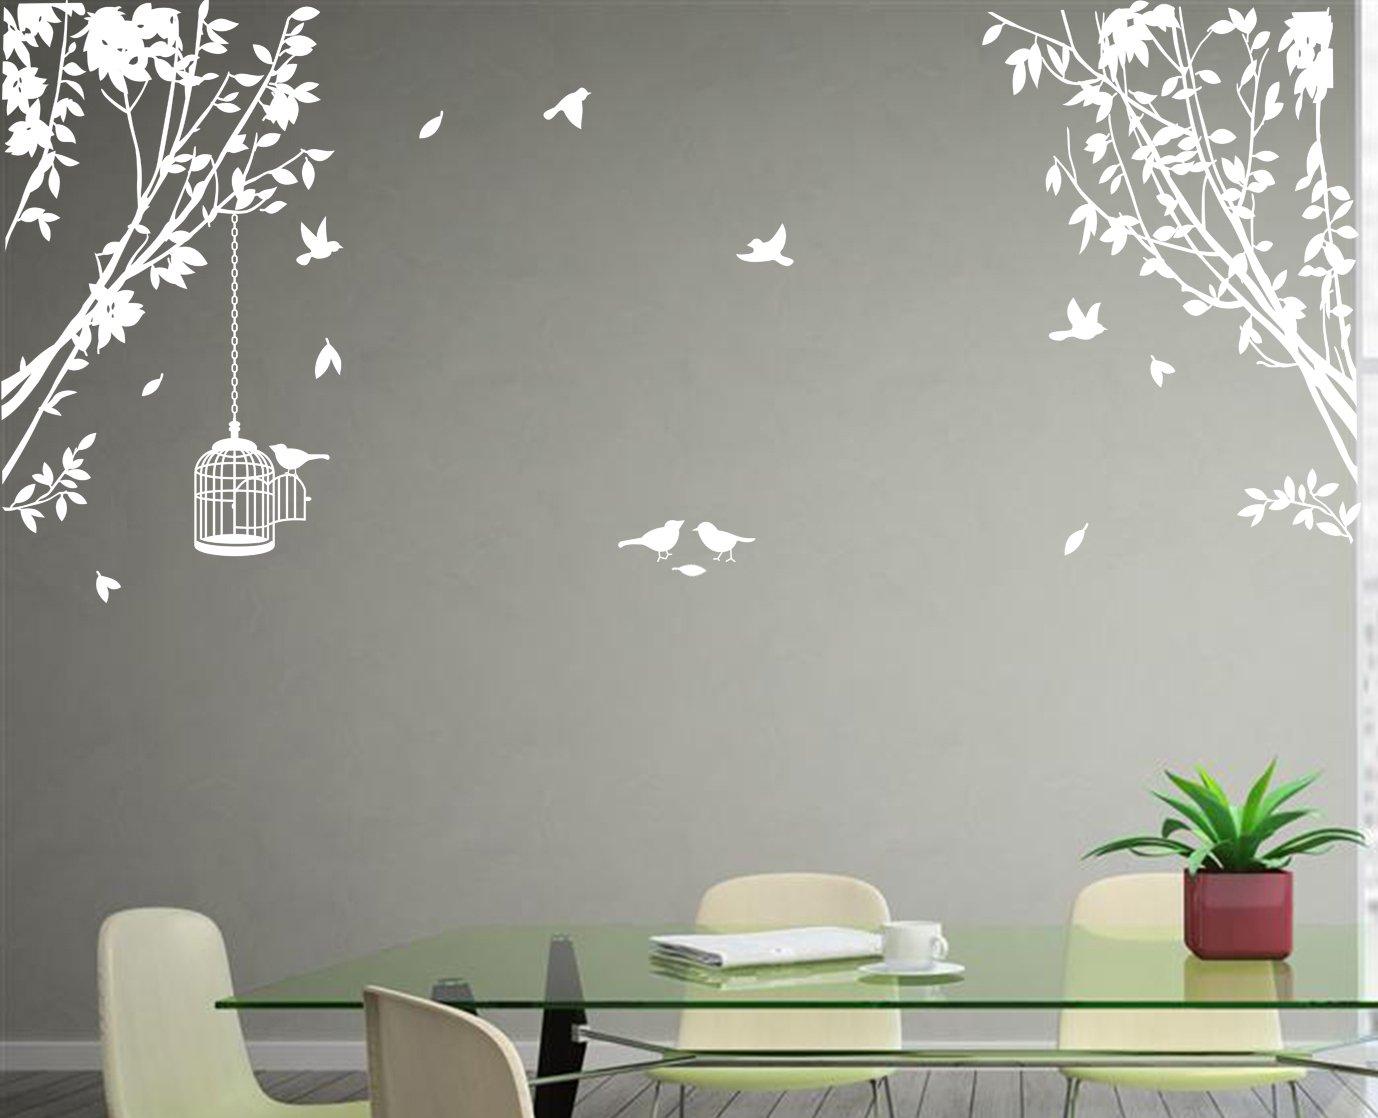 Large Side Wall Tree Art Vinyl Wall Sticker DIY Wall Decal